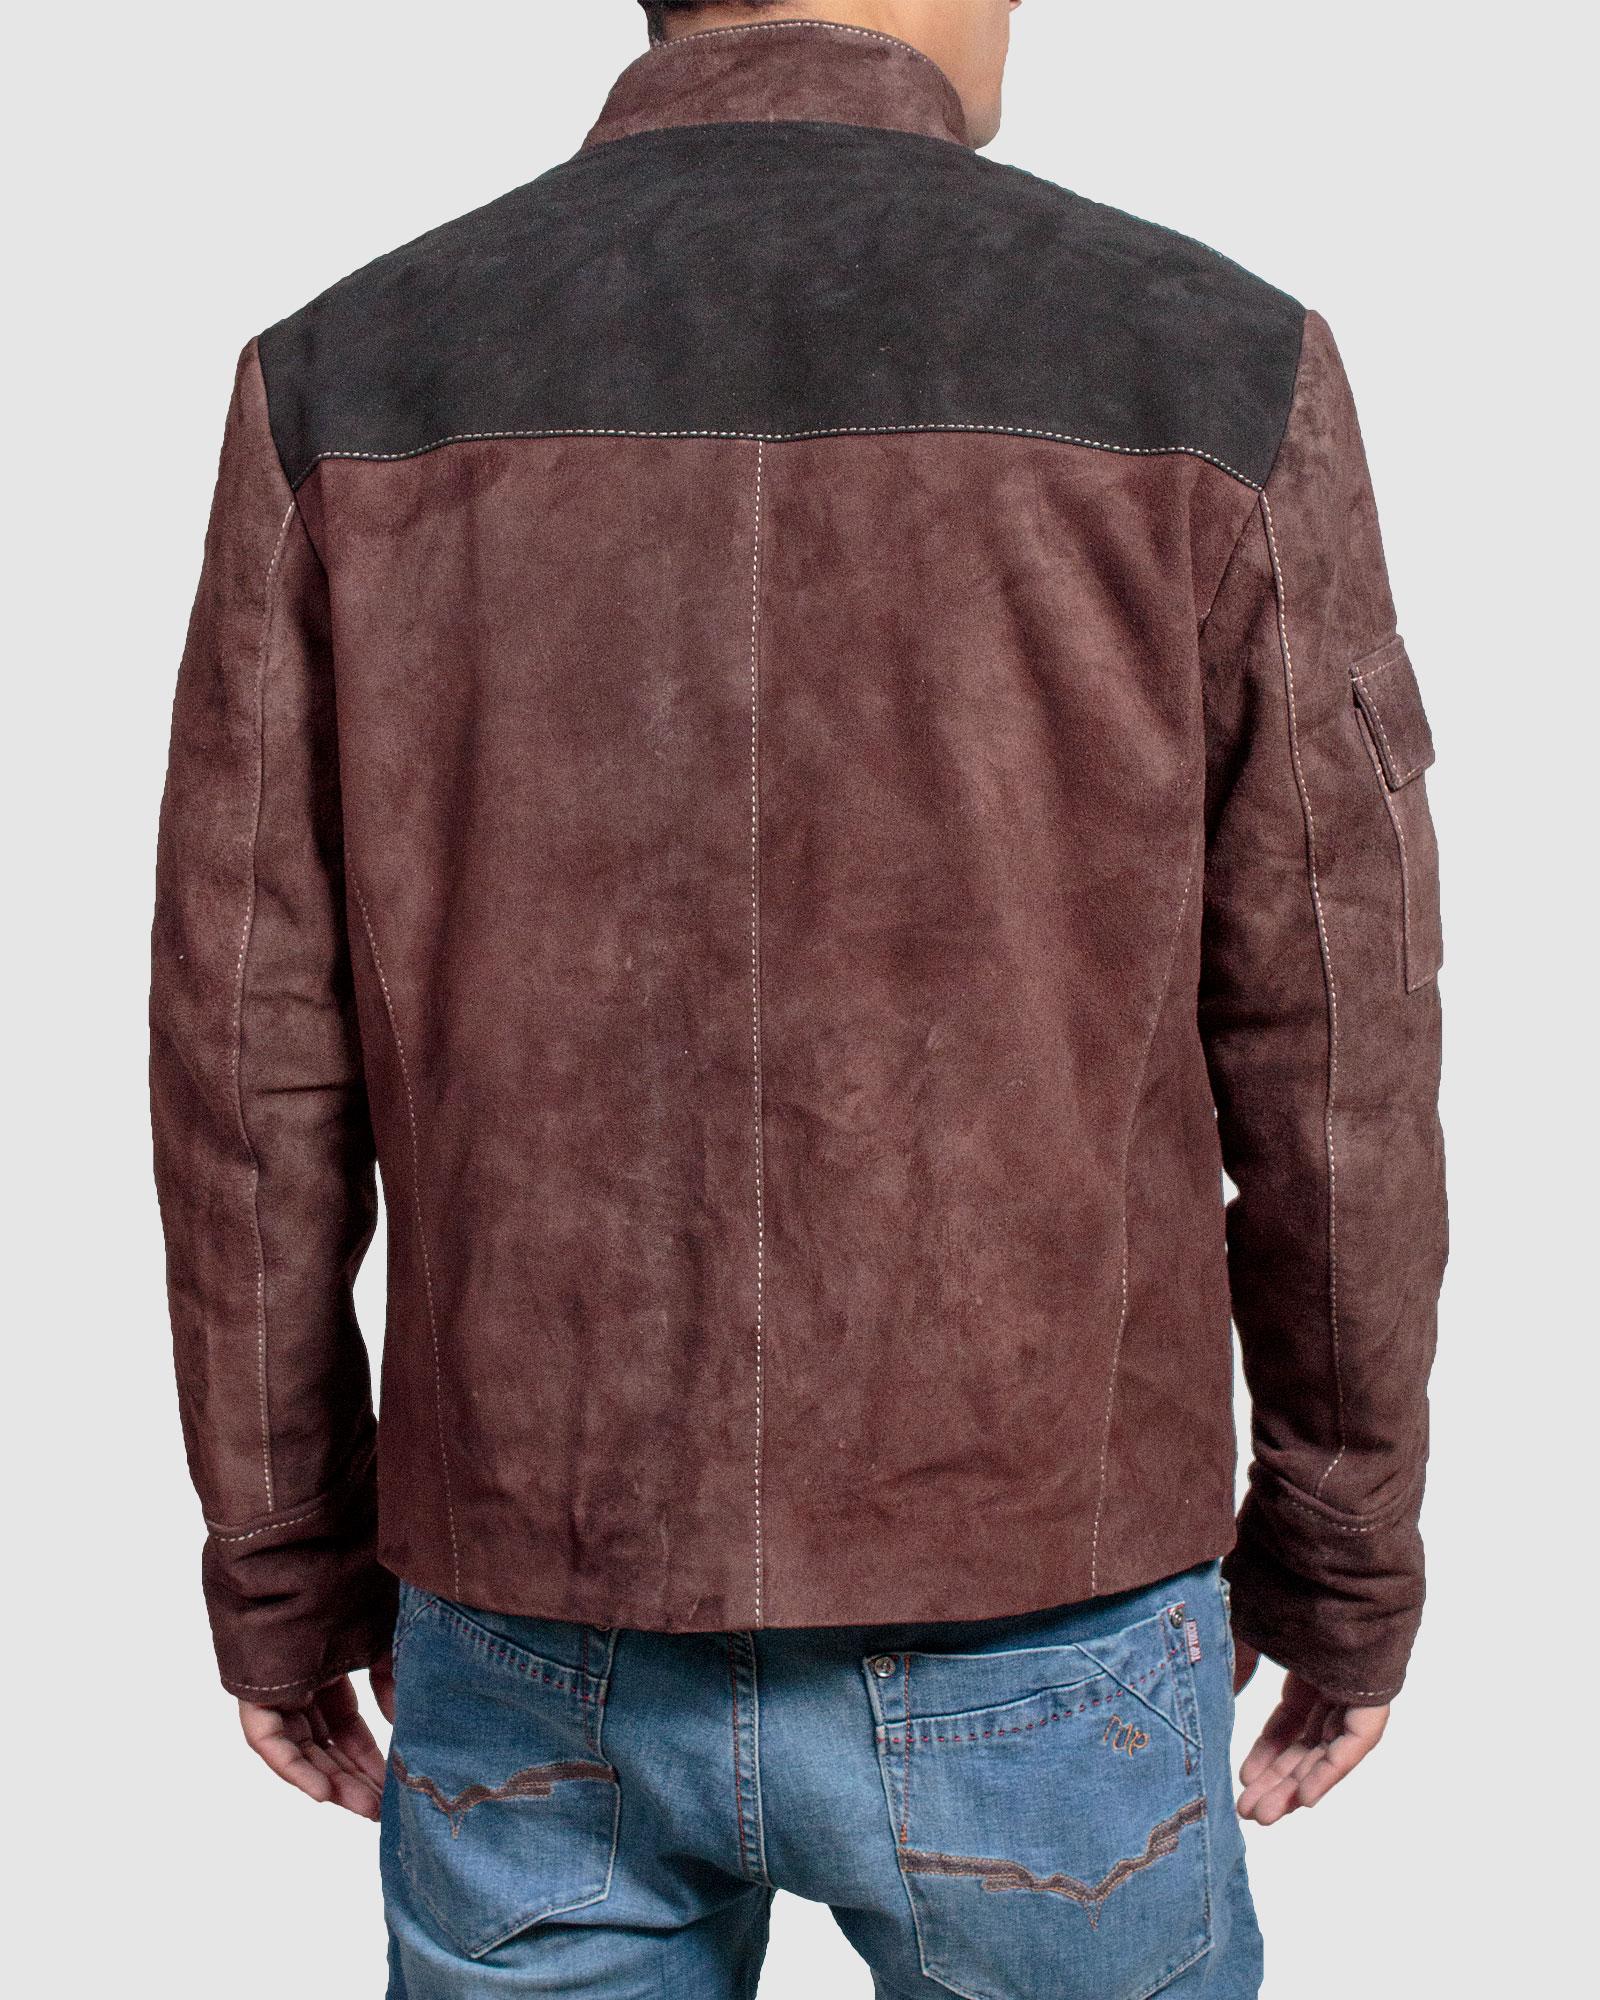 han-solo-jacket-a-star-wars-story-alden-ehrenreich-jacket-d